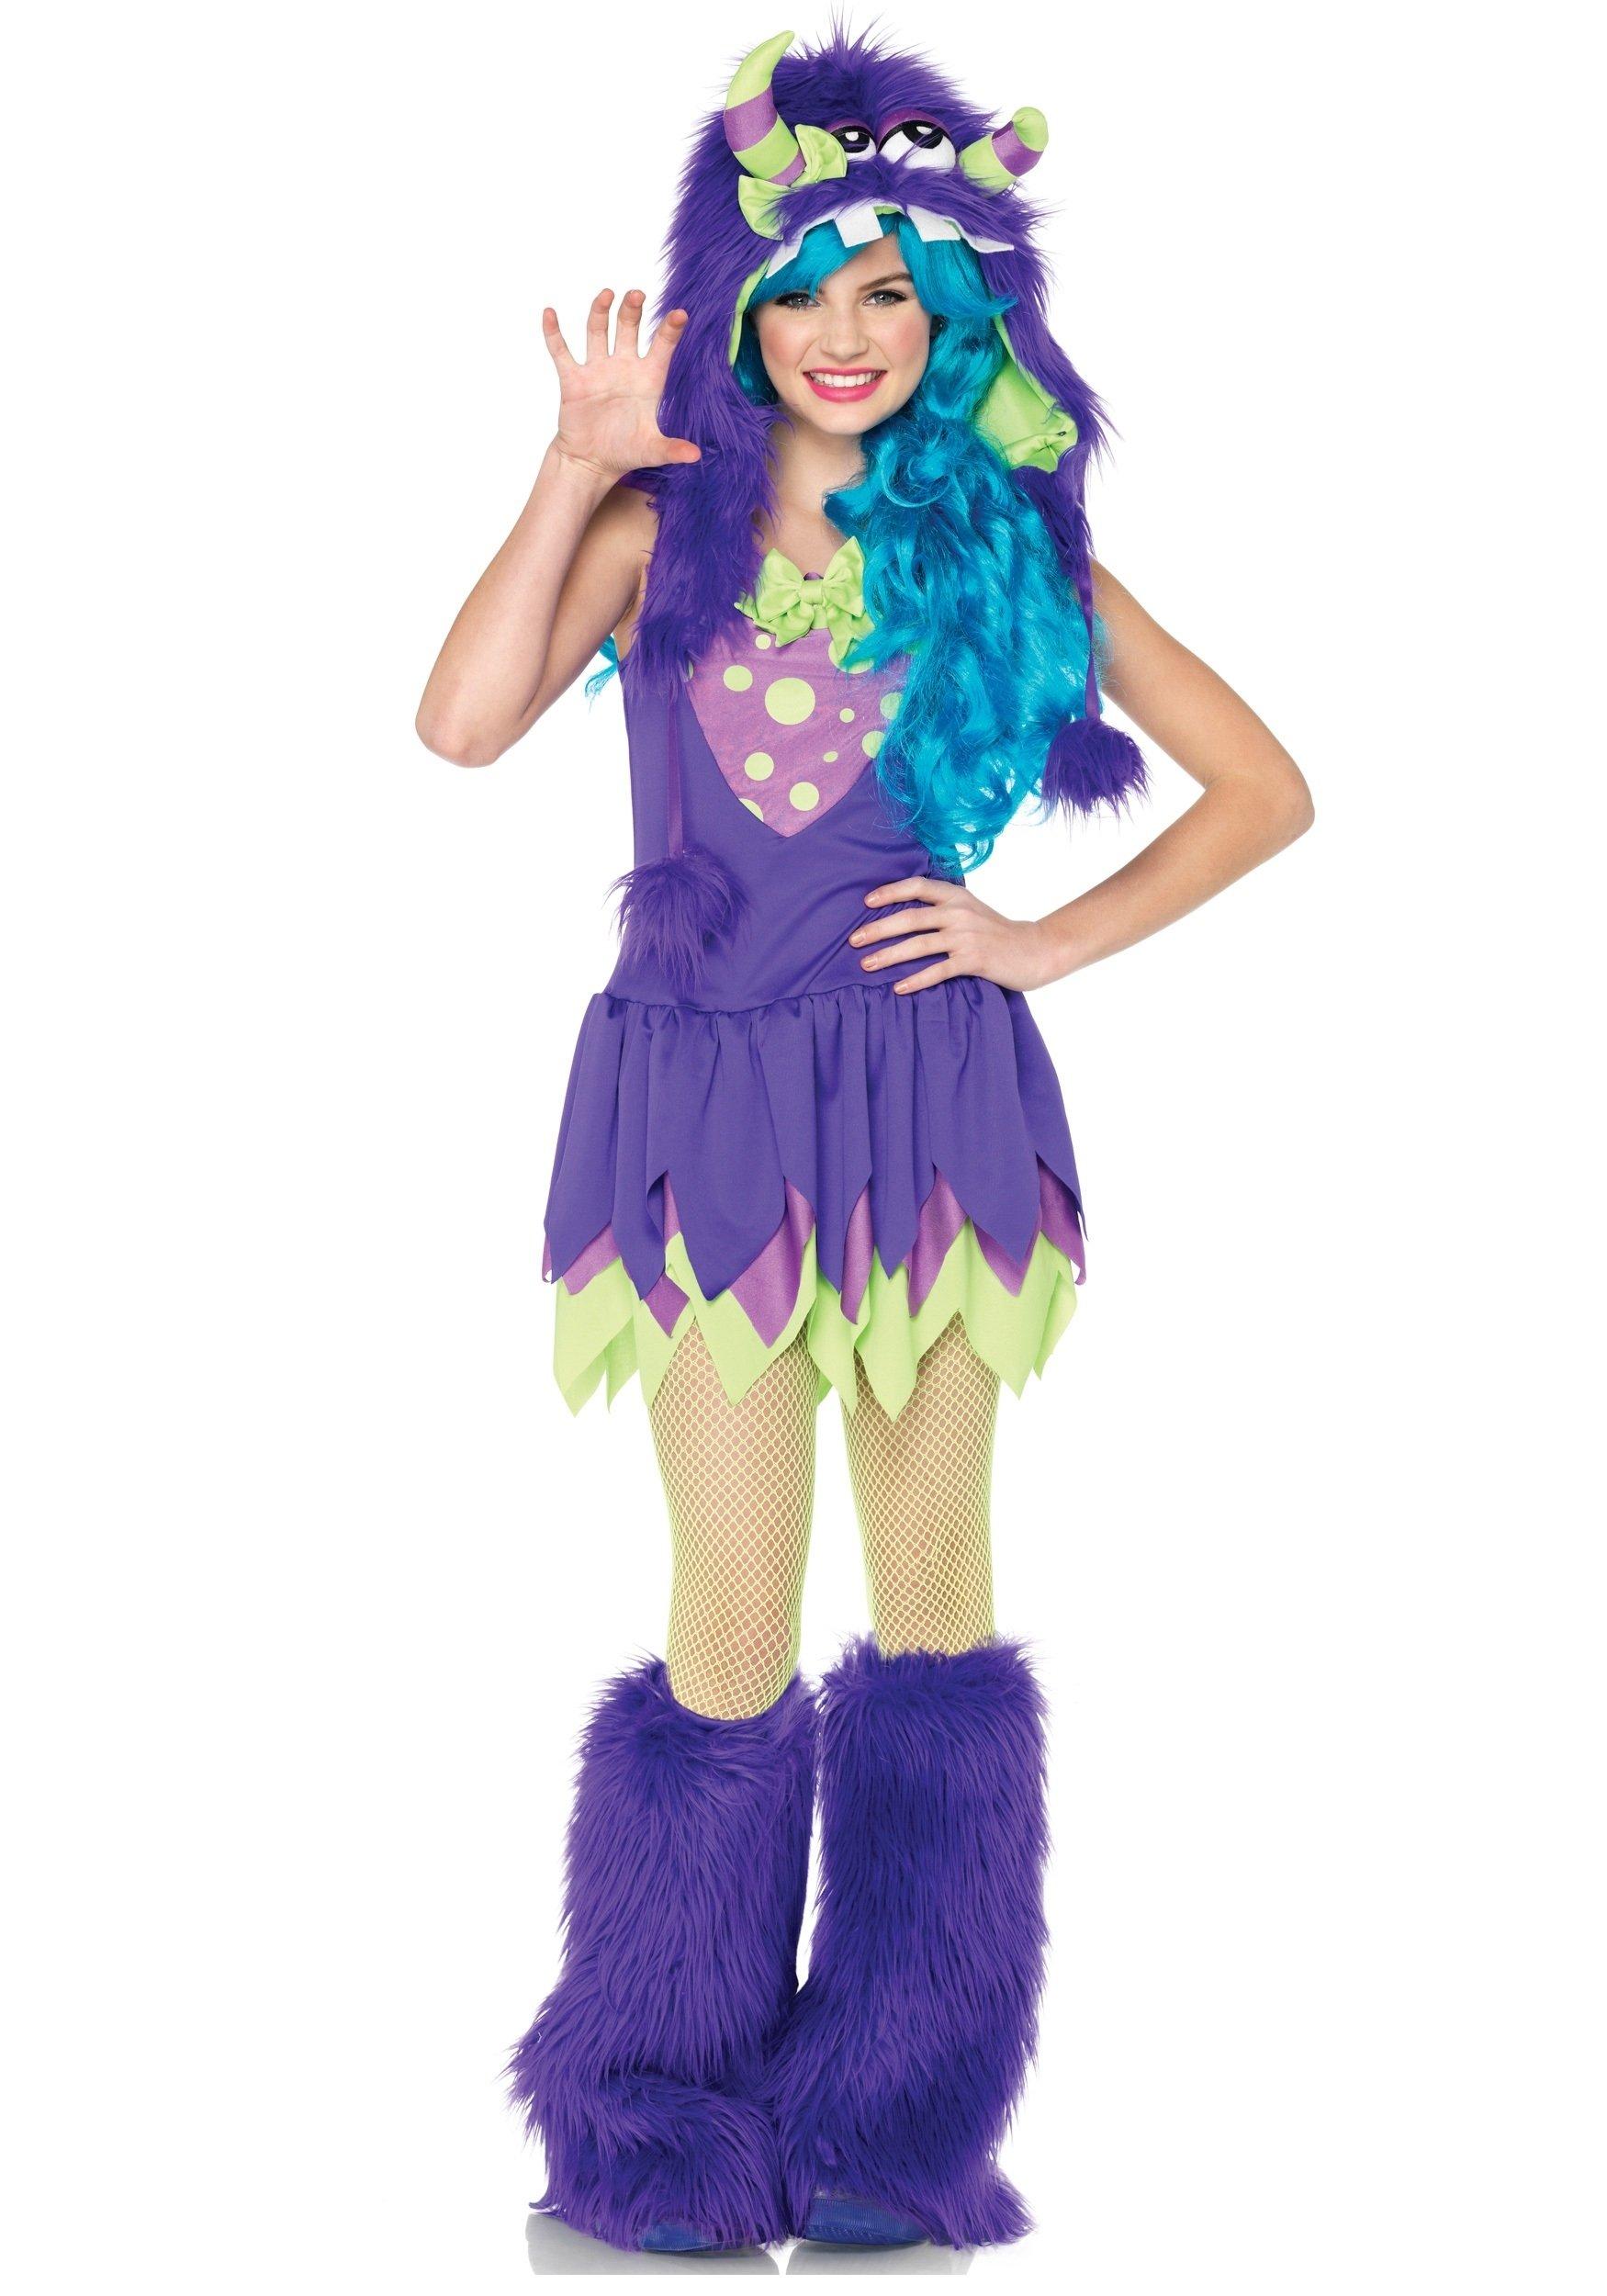 10 Gorgeous Funny Girl Halloween Costume Ideas homemade halloween costumes for tweens teenage girl halloween 2021